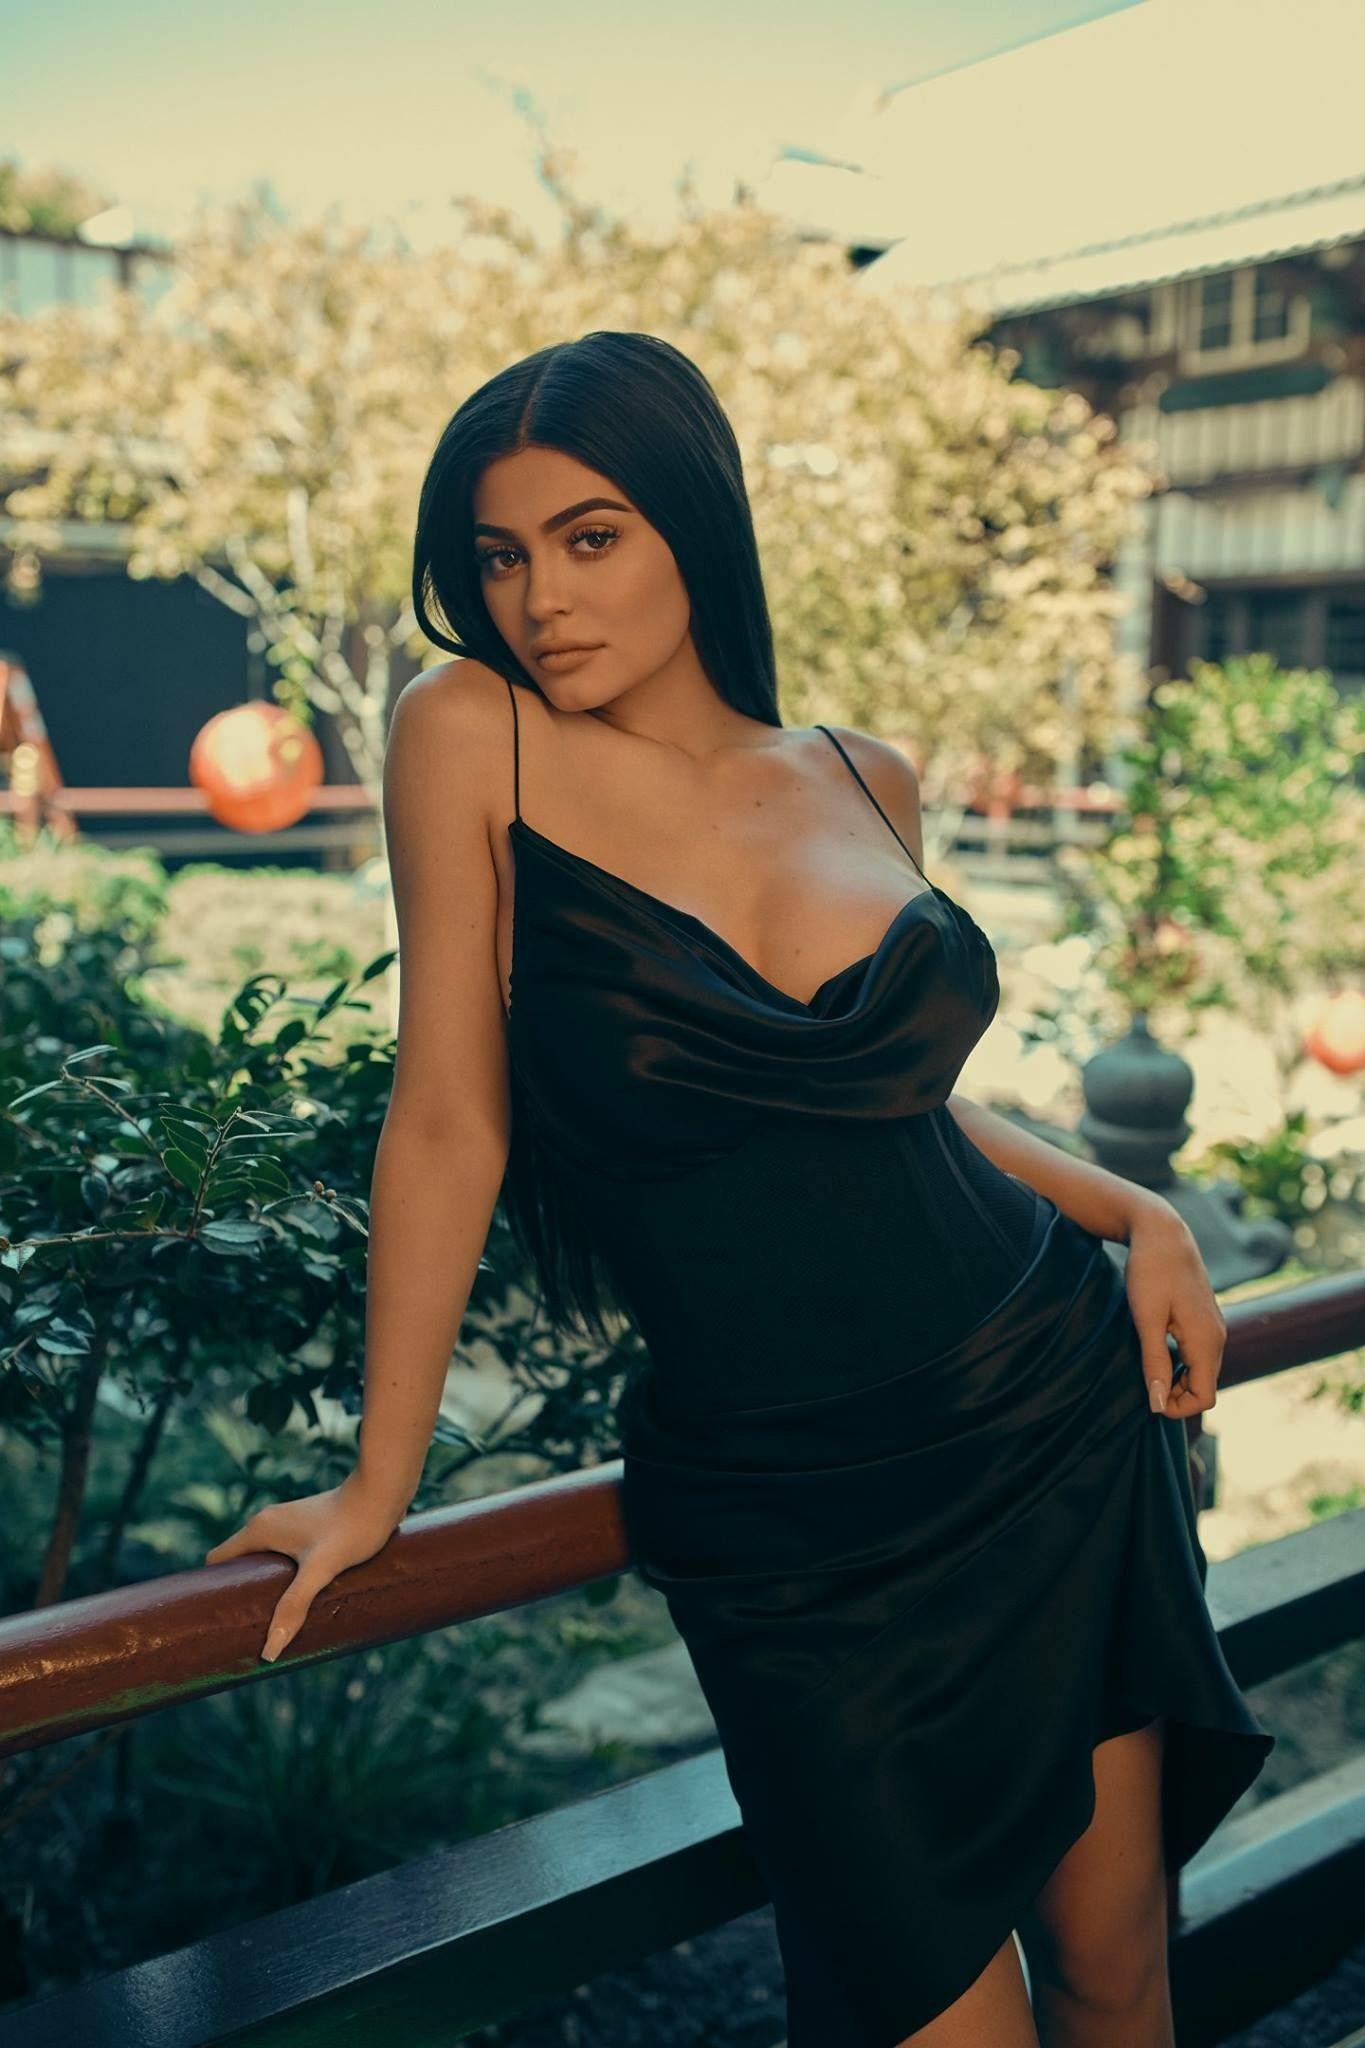 26a502939 Pin de Liina em ♔ King Kylie Jenner ♔